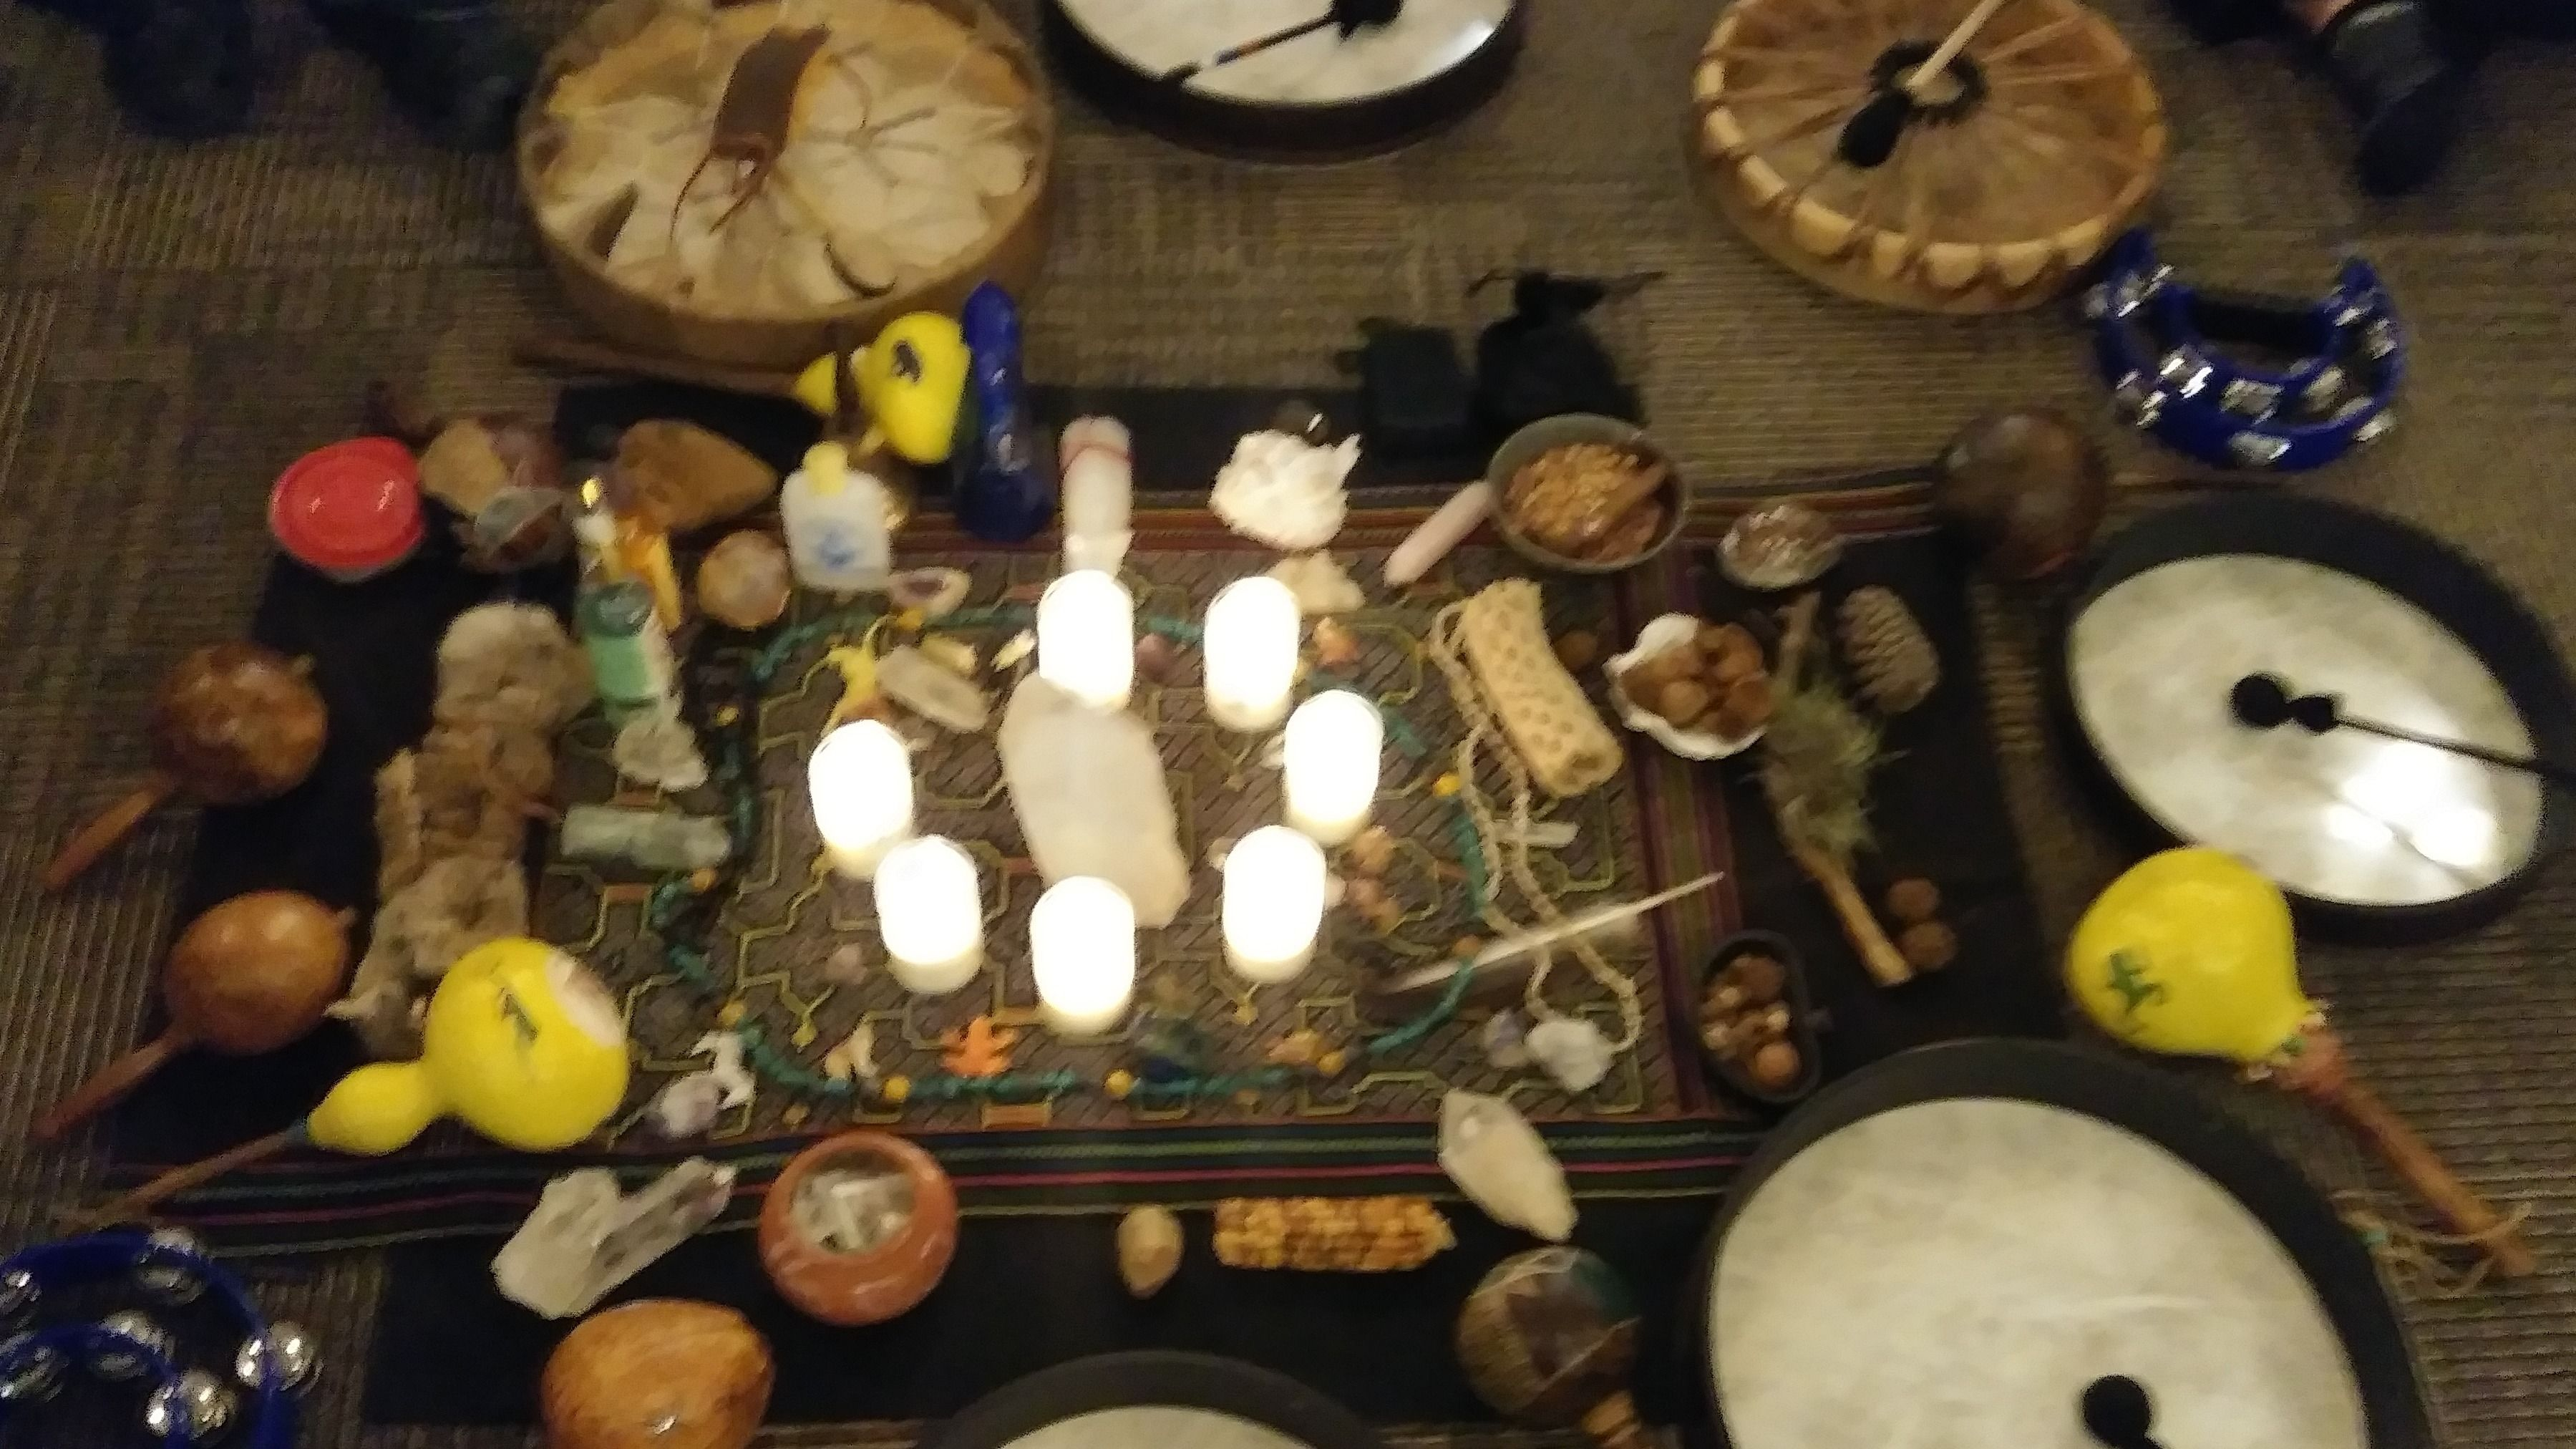 Sacred Circle Shamanism and Metaphysical Meetup of Houston